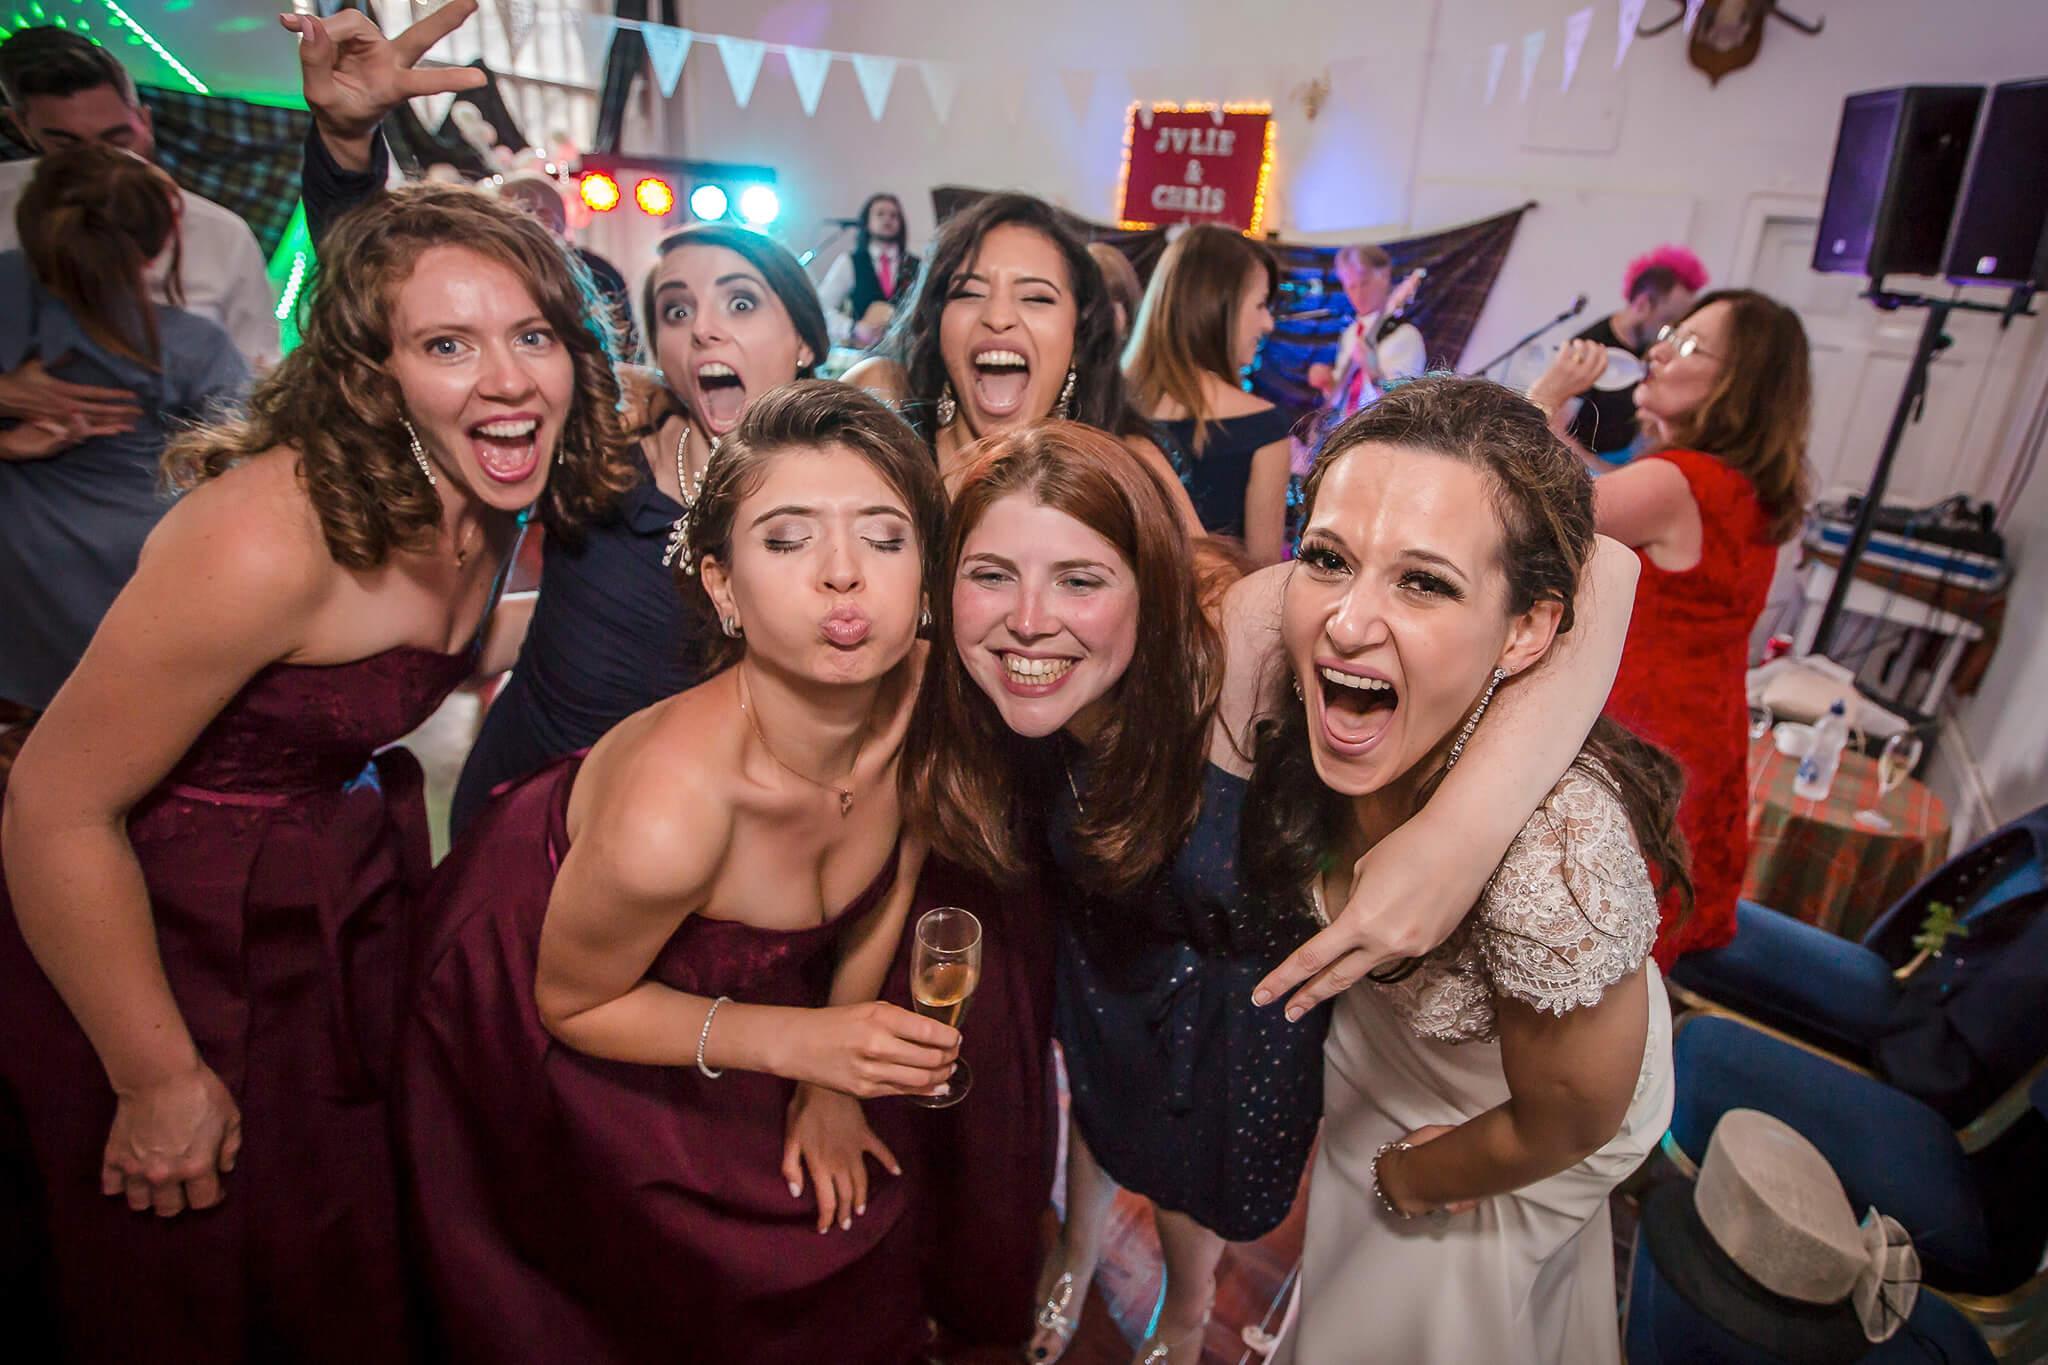 duns-castle-wedding-photograper-scotland-stanbury-photography-025